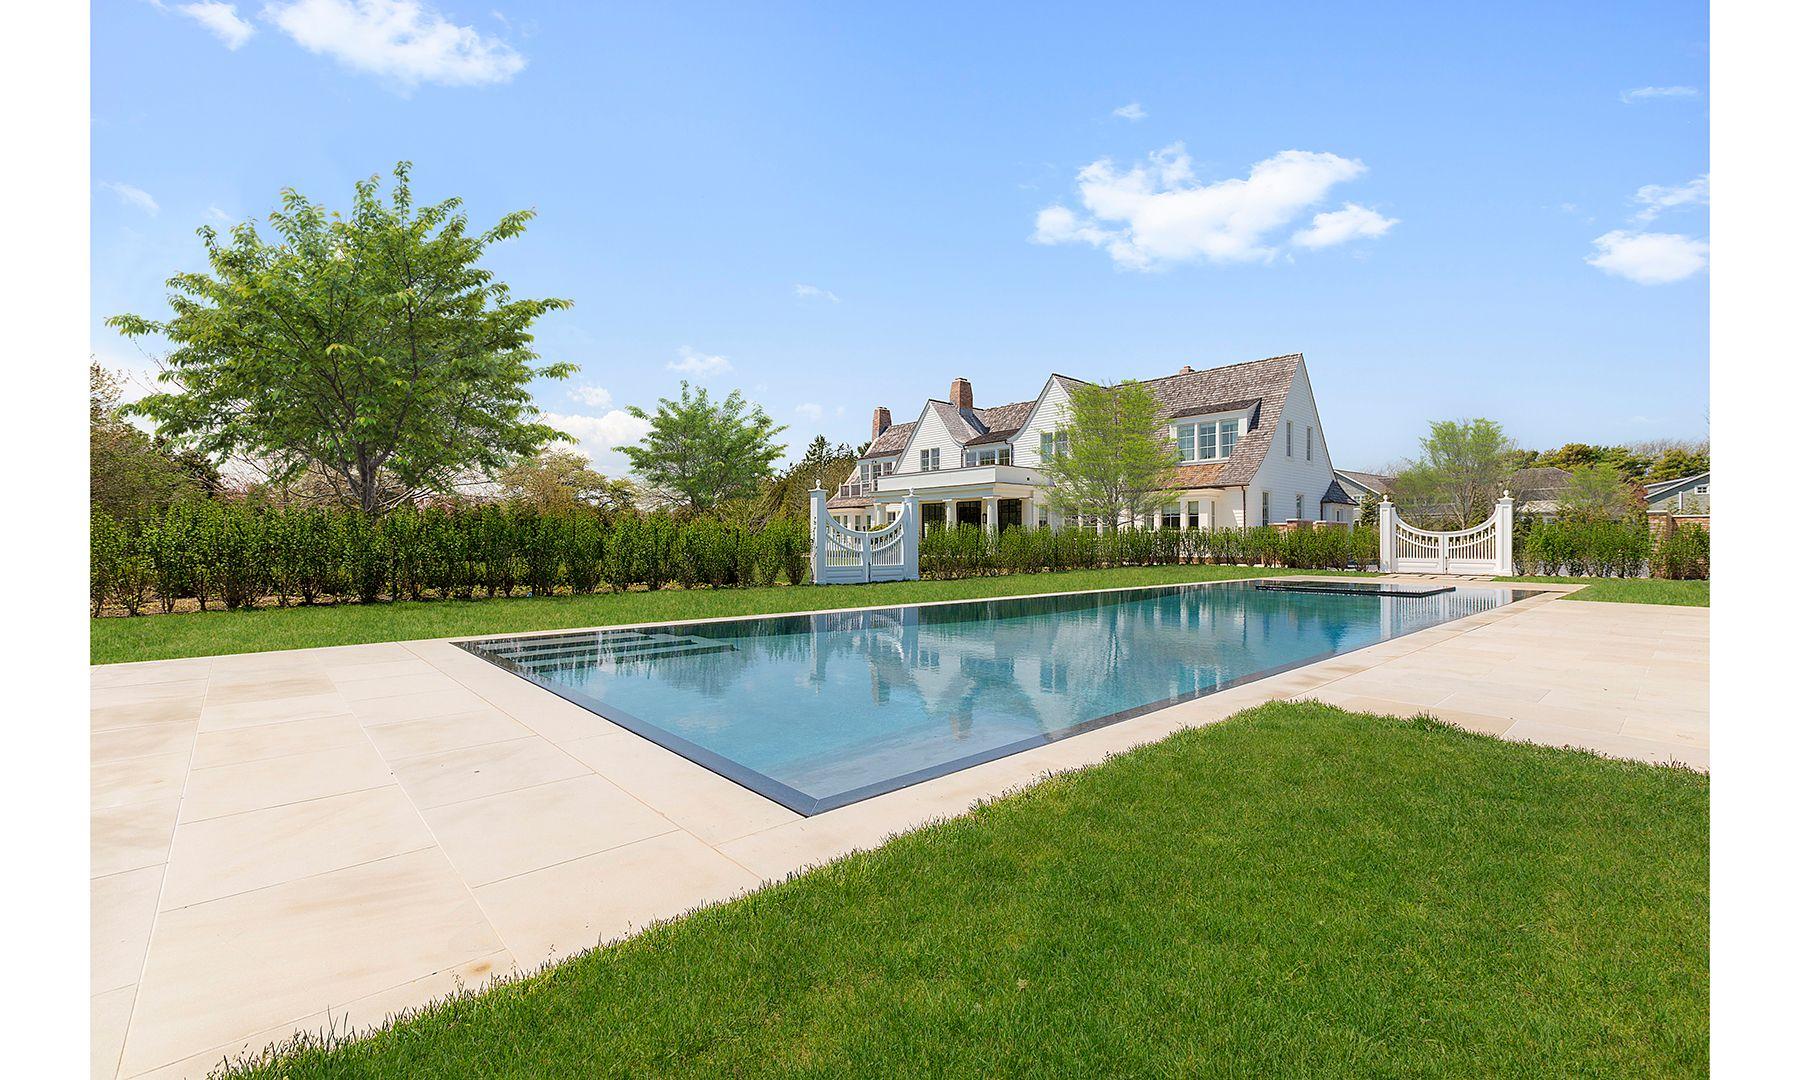 490 Hedges Lane Sagaponack Dujour Hamptons Beach House Hamptons House Luxury Real Estate